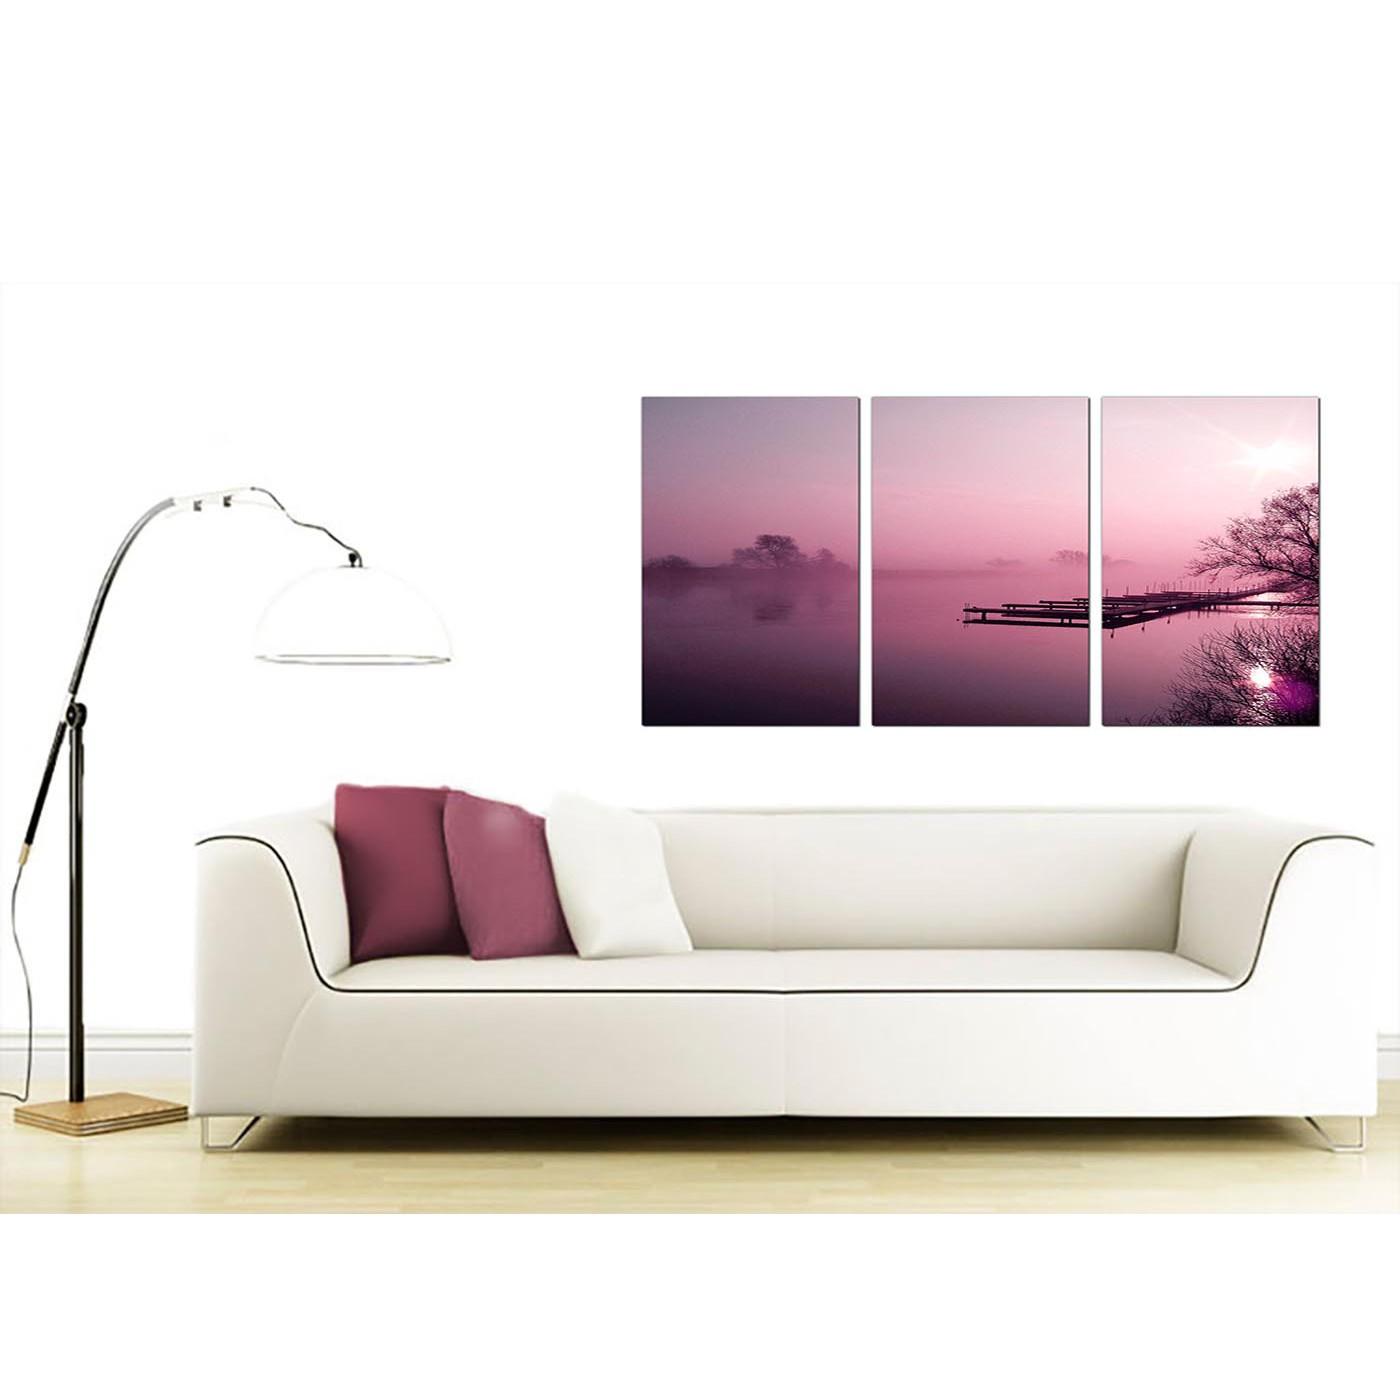 Display Gallery Item 4 3 Panel Landscape Canvas Prints UK 125cm X 60cm 3120 5